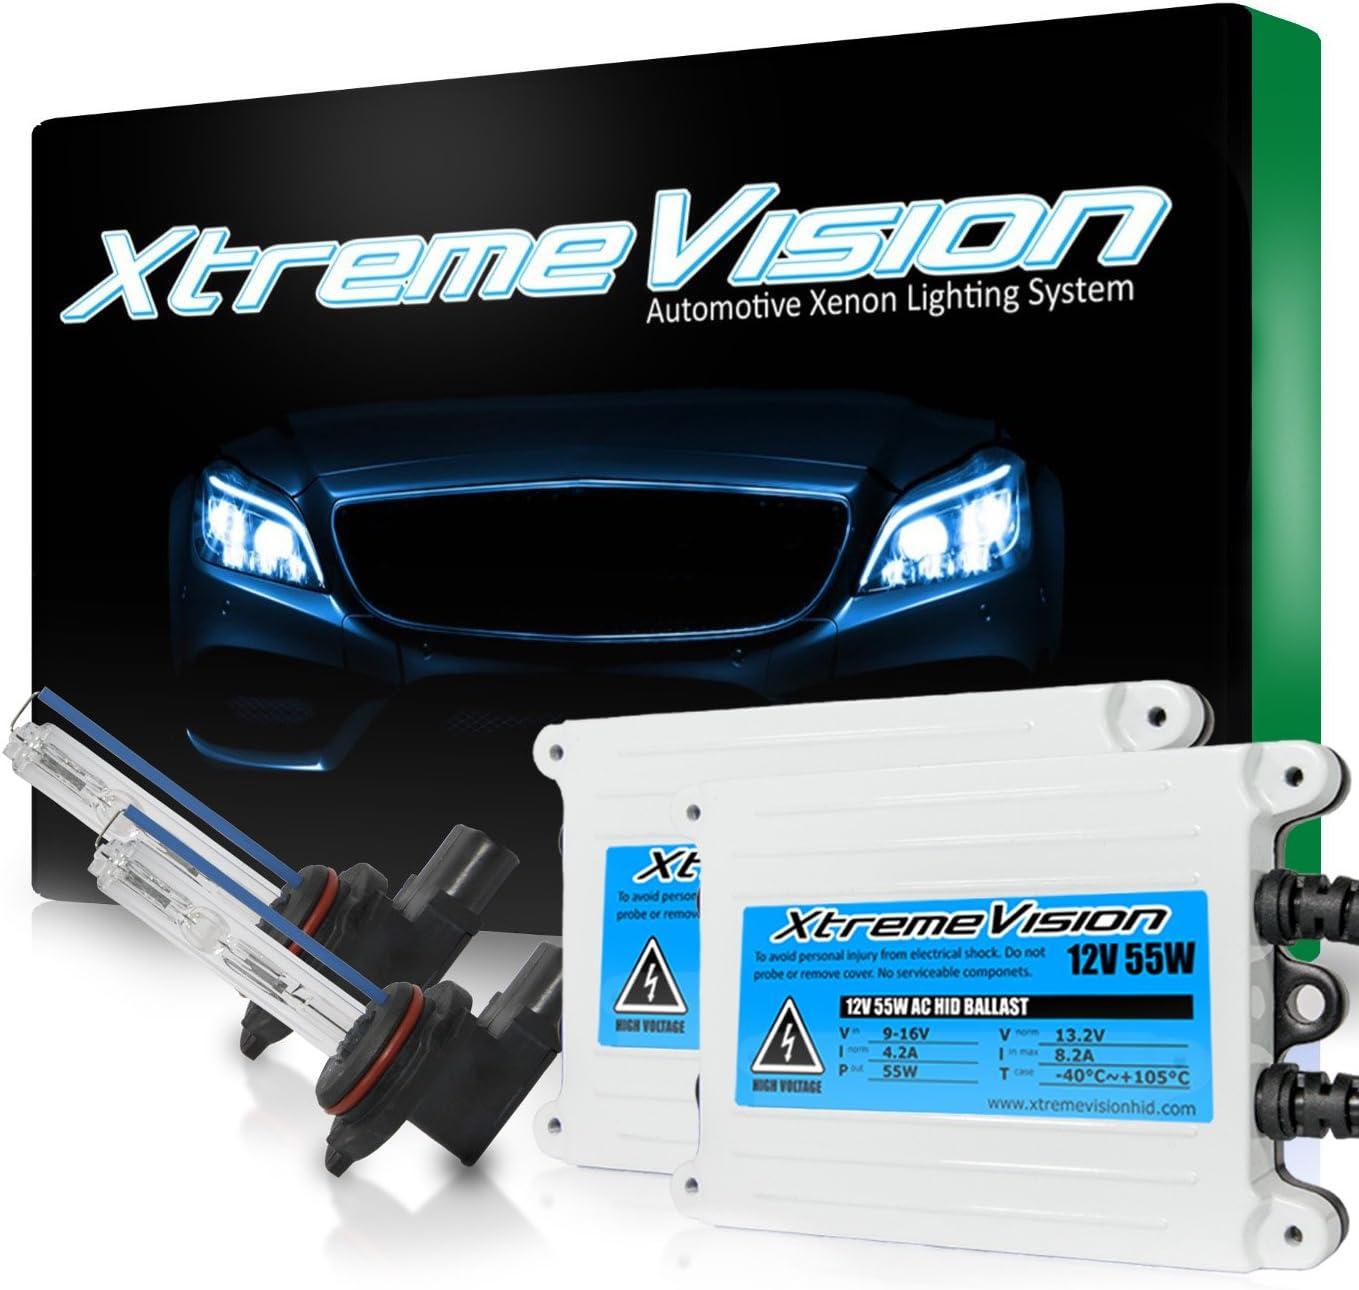 XtremeVision 55W いつでも送料無料 AC Xenon HID Bundle Pai Slim 1 毎日がバーゲンセール Ballast with